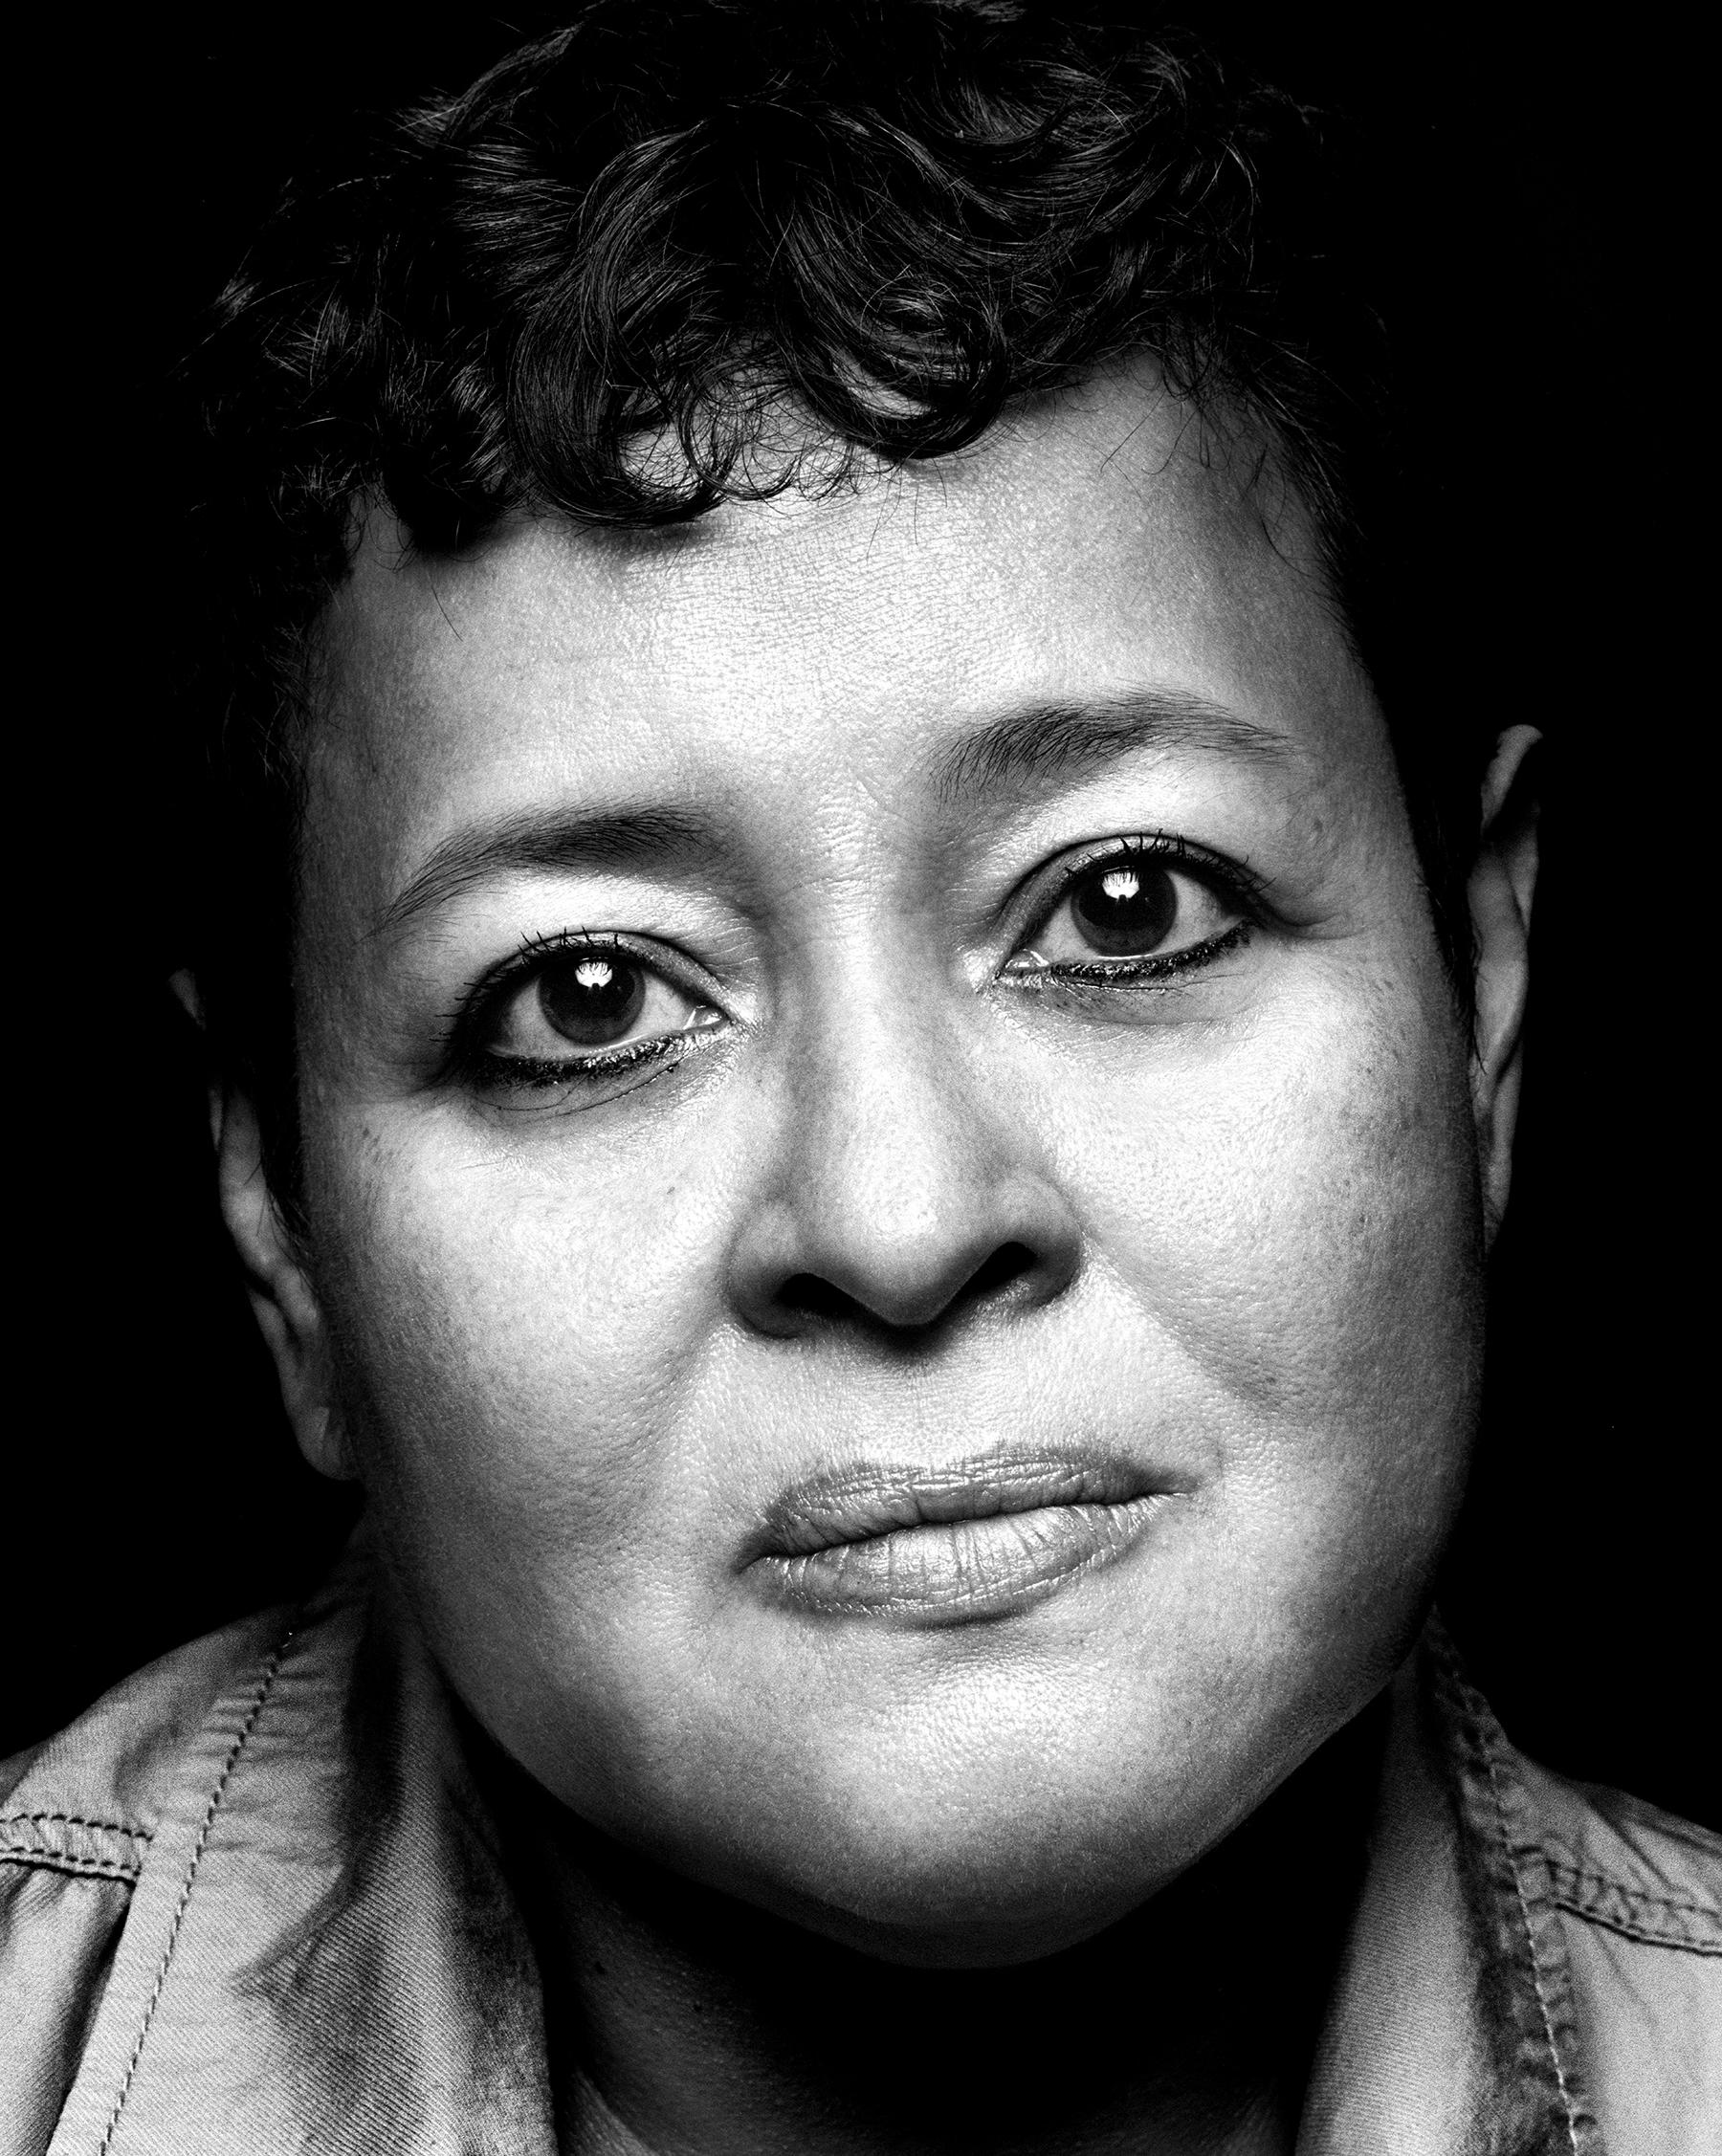 Alina Diaz. Photo by Platon for The People's Portfolio